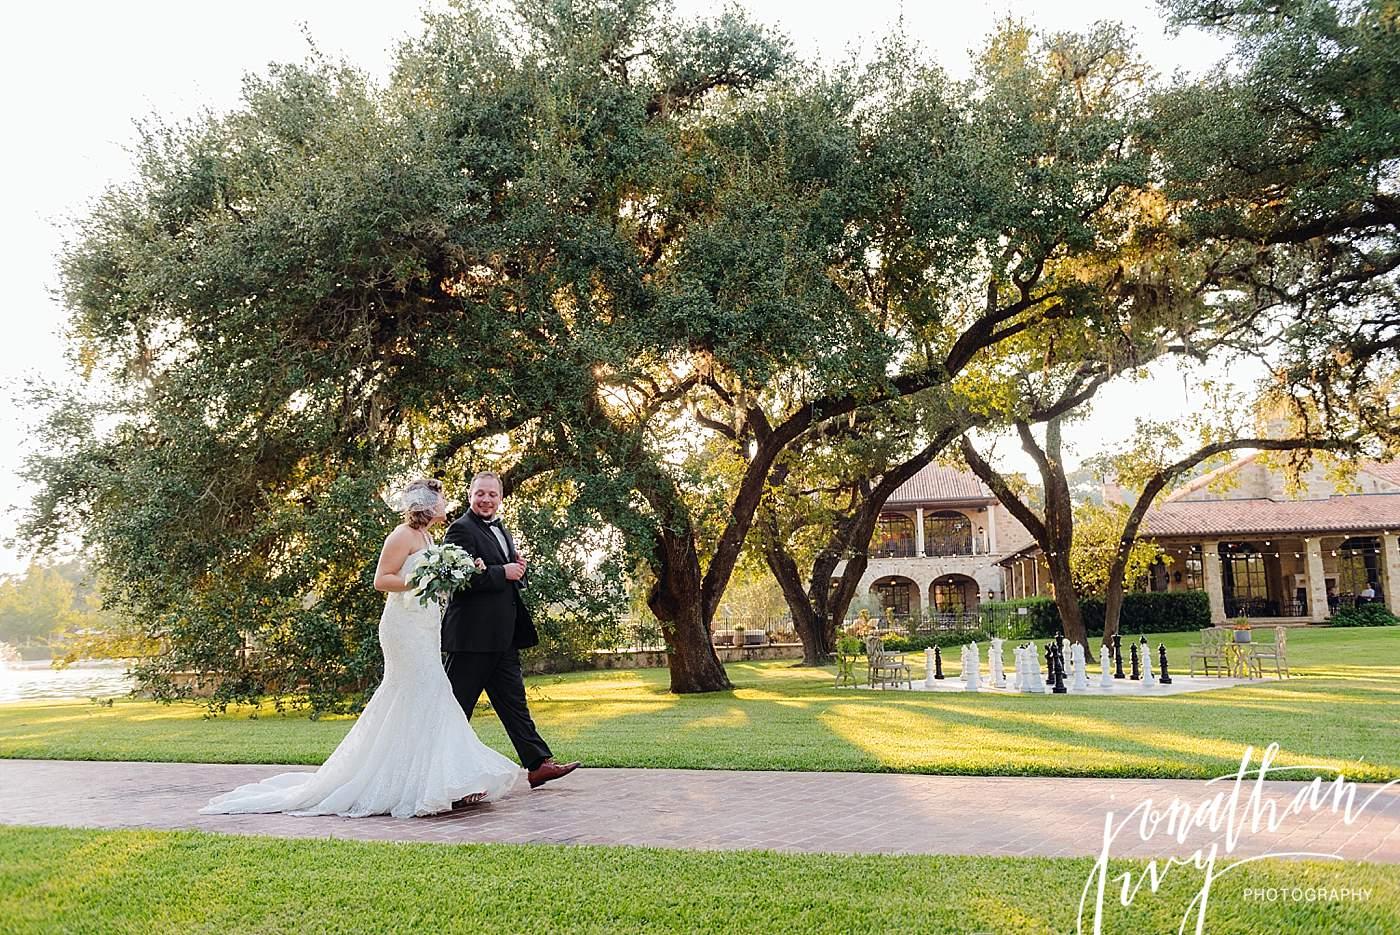 Outdoor Wedding Venues in Houston